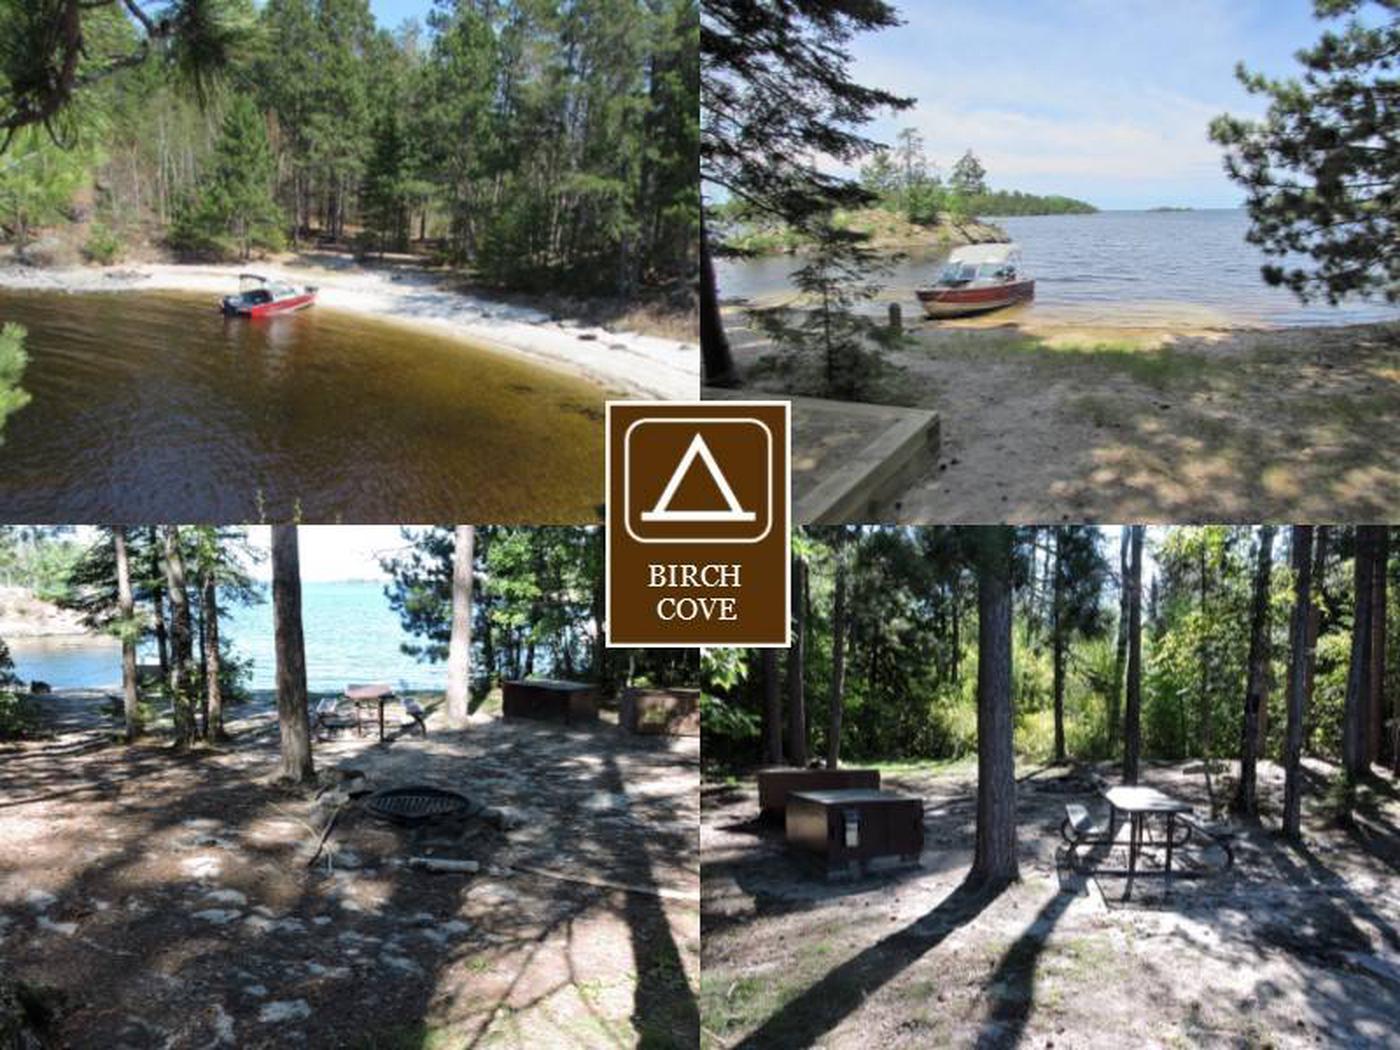 N1 - Birch CoveN1 - Birch Cove campsite on Namakan Lake